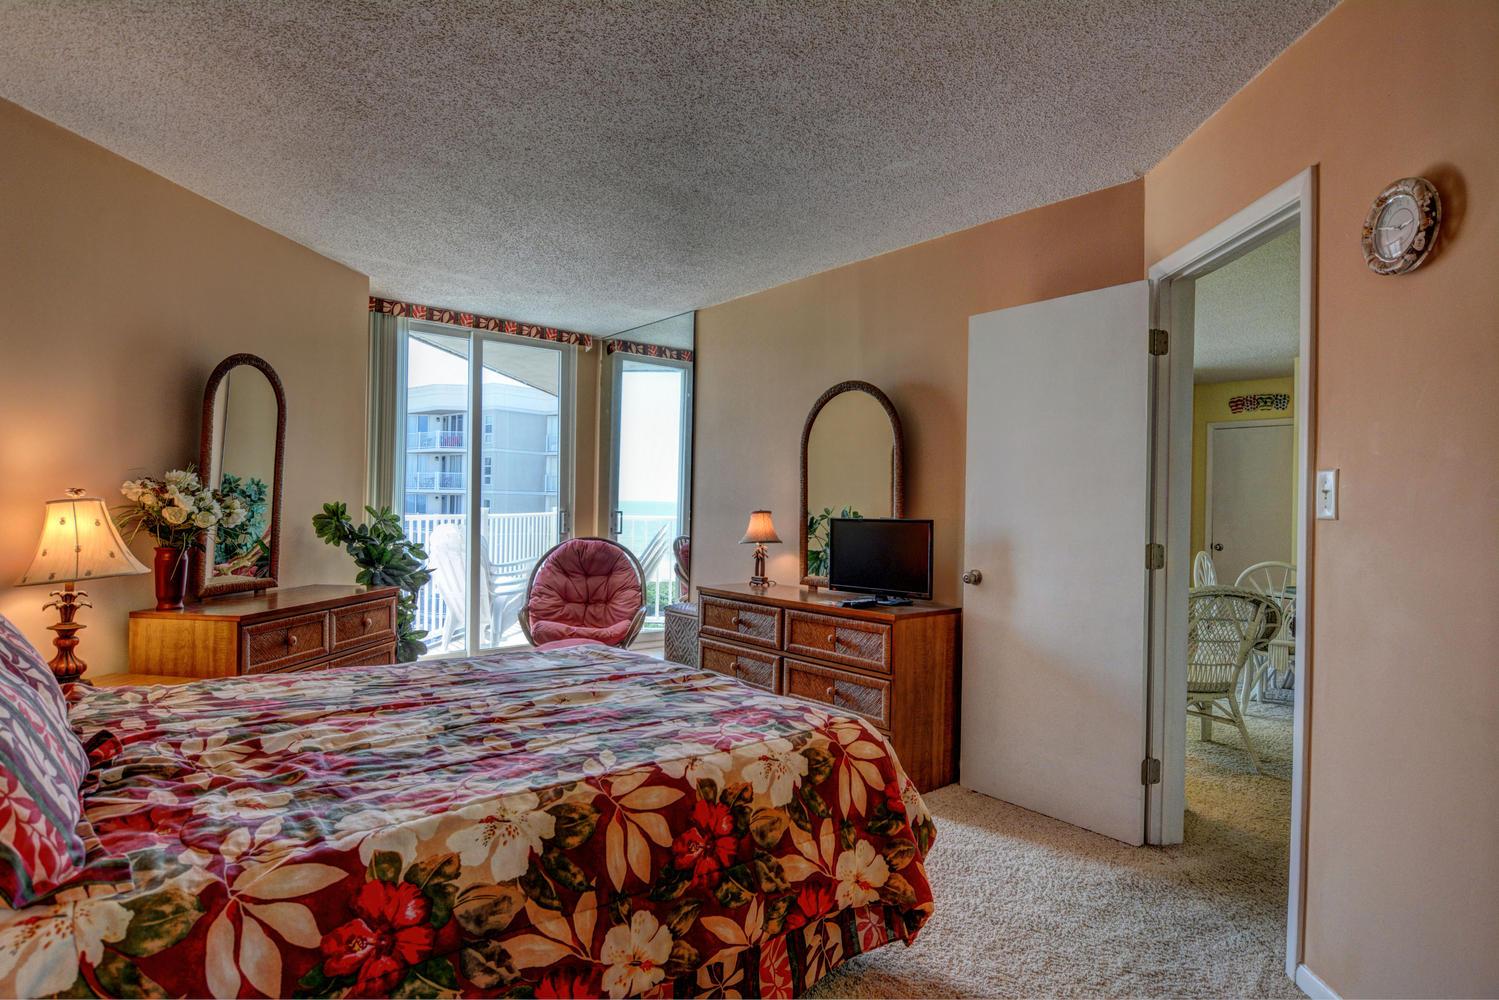 2000 New River Inlet Rd Unit-large-017-28-Master Bedroom-1499x1000-72dpi.jpg